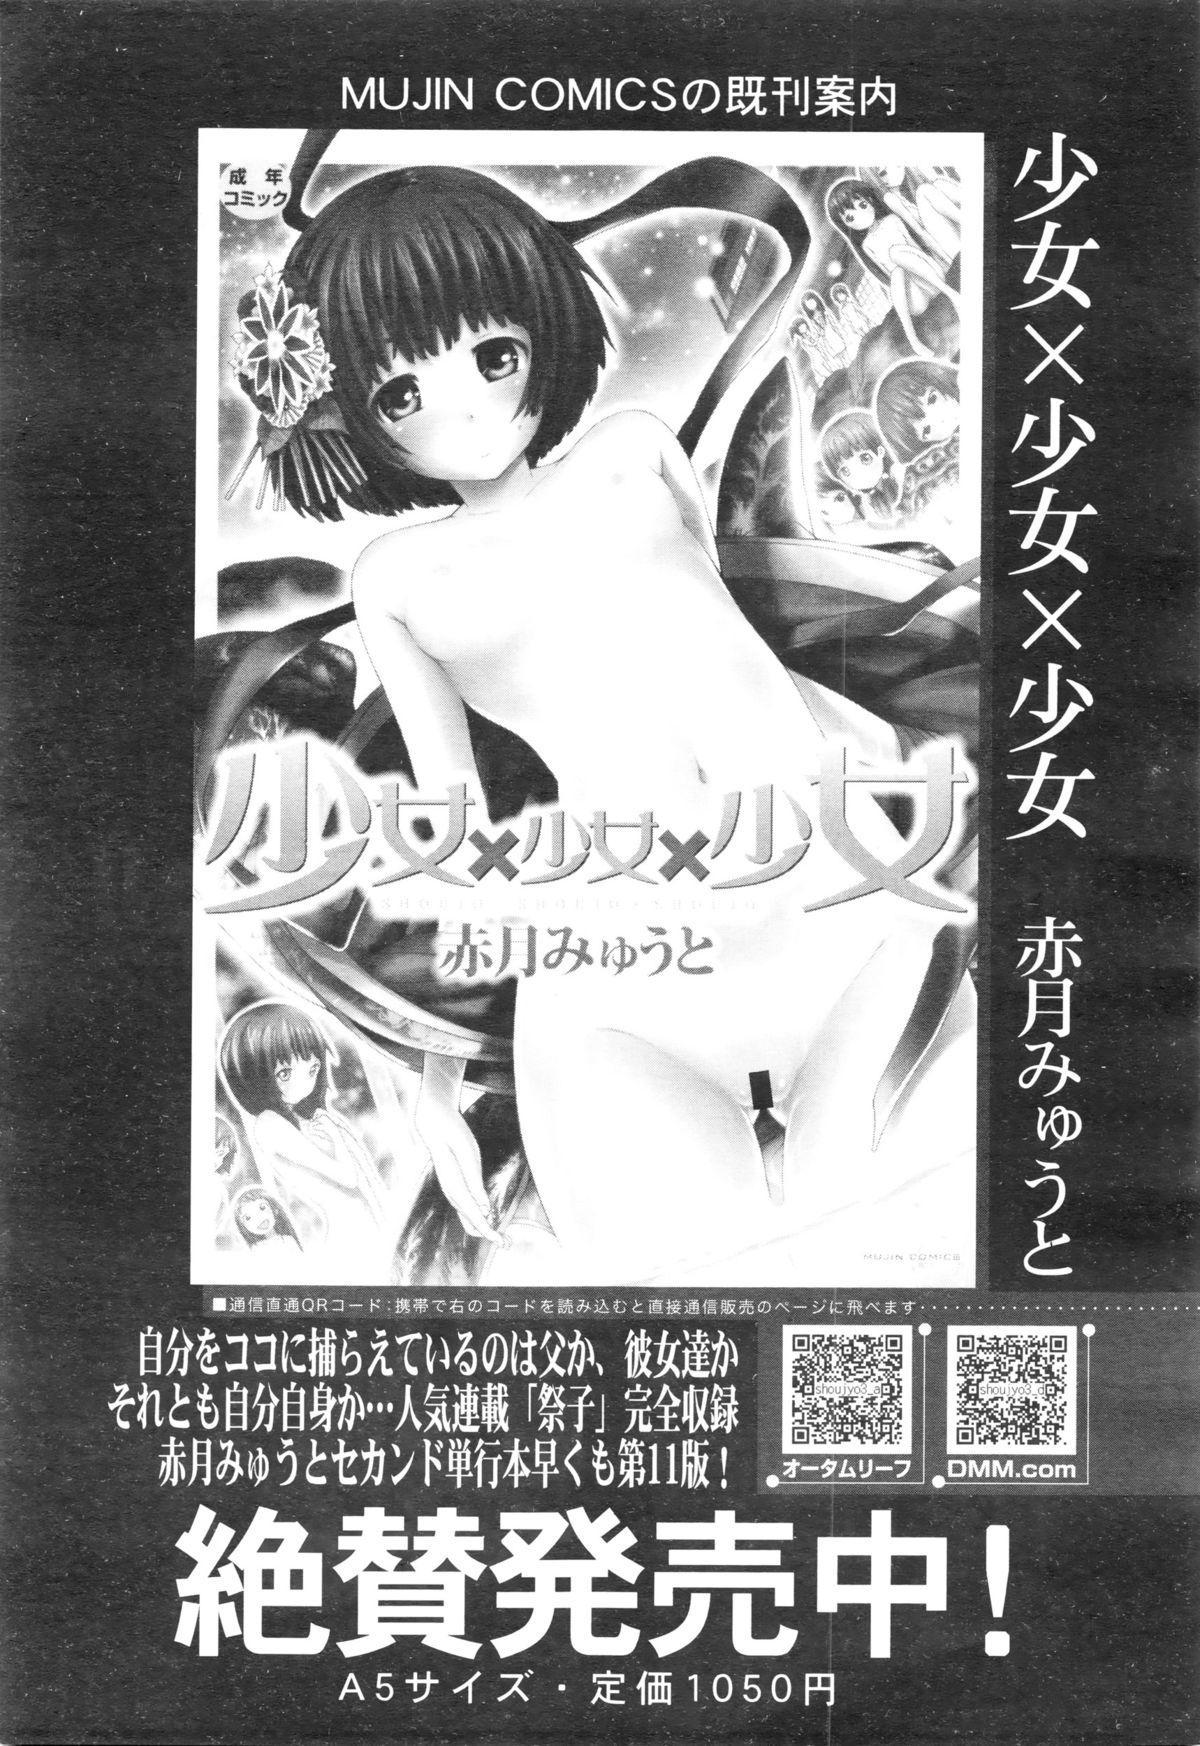 COMIC Mugen Tensei 2016-01 462